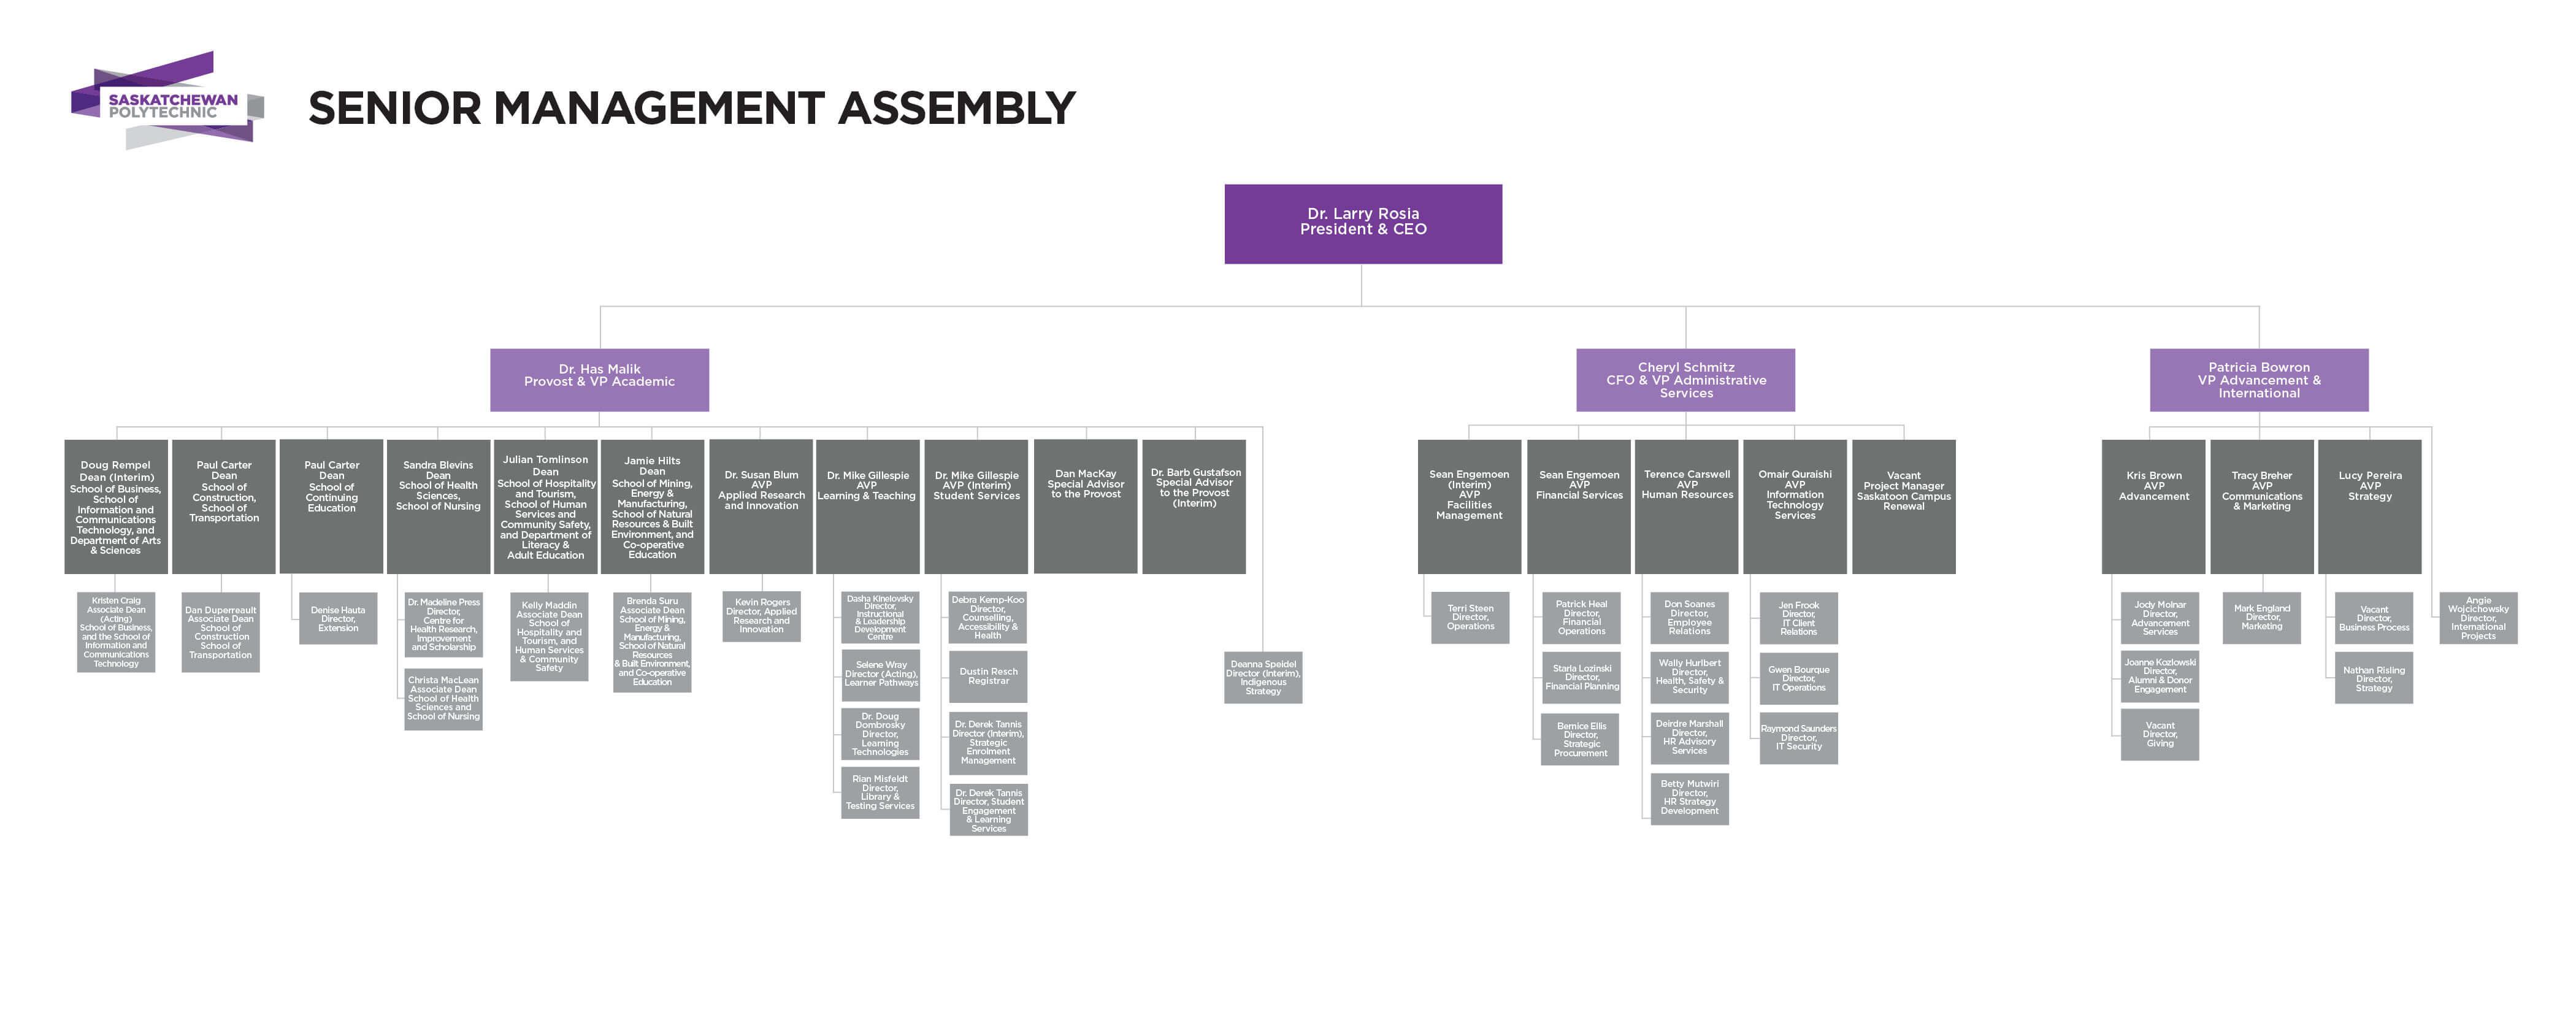 University business development strategy